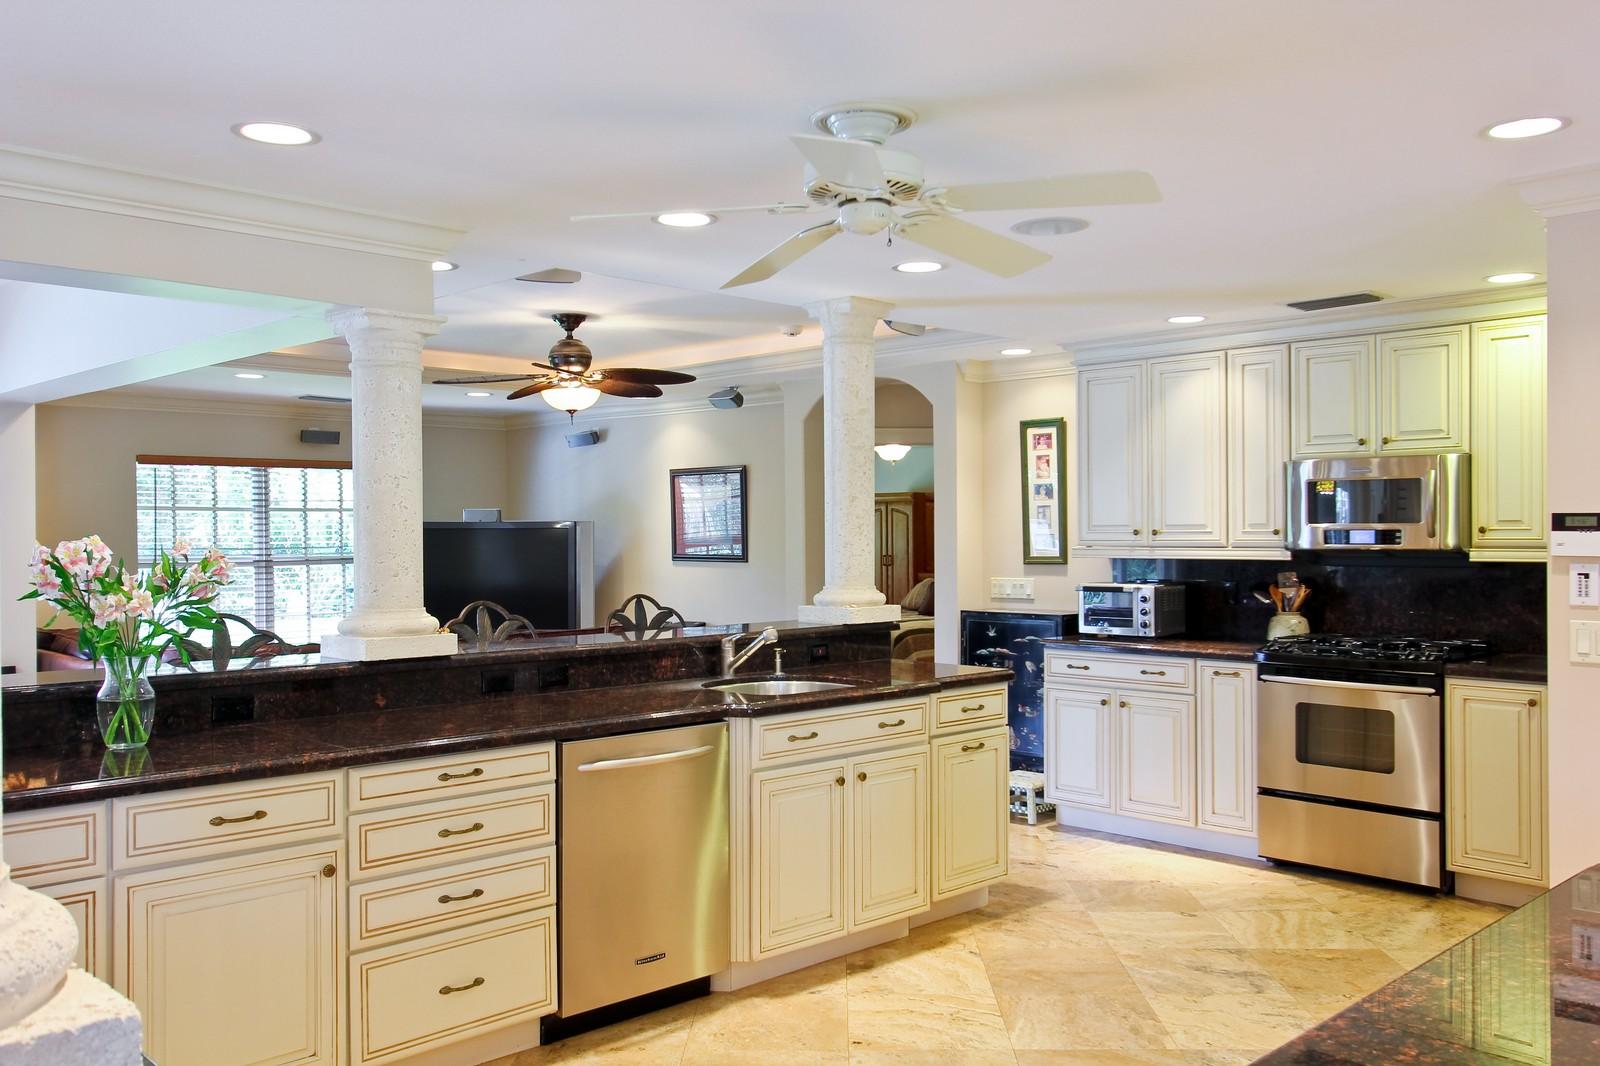 Real Estate Photography - 430 N. Lyra Circle, Juno Beach, FL, 33408 - Kitchen